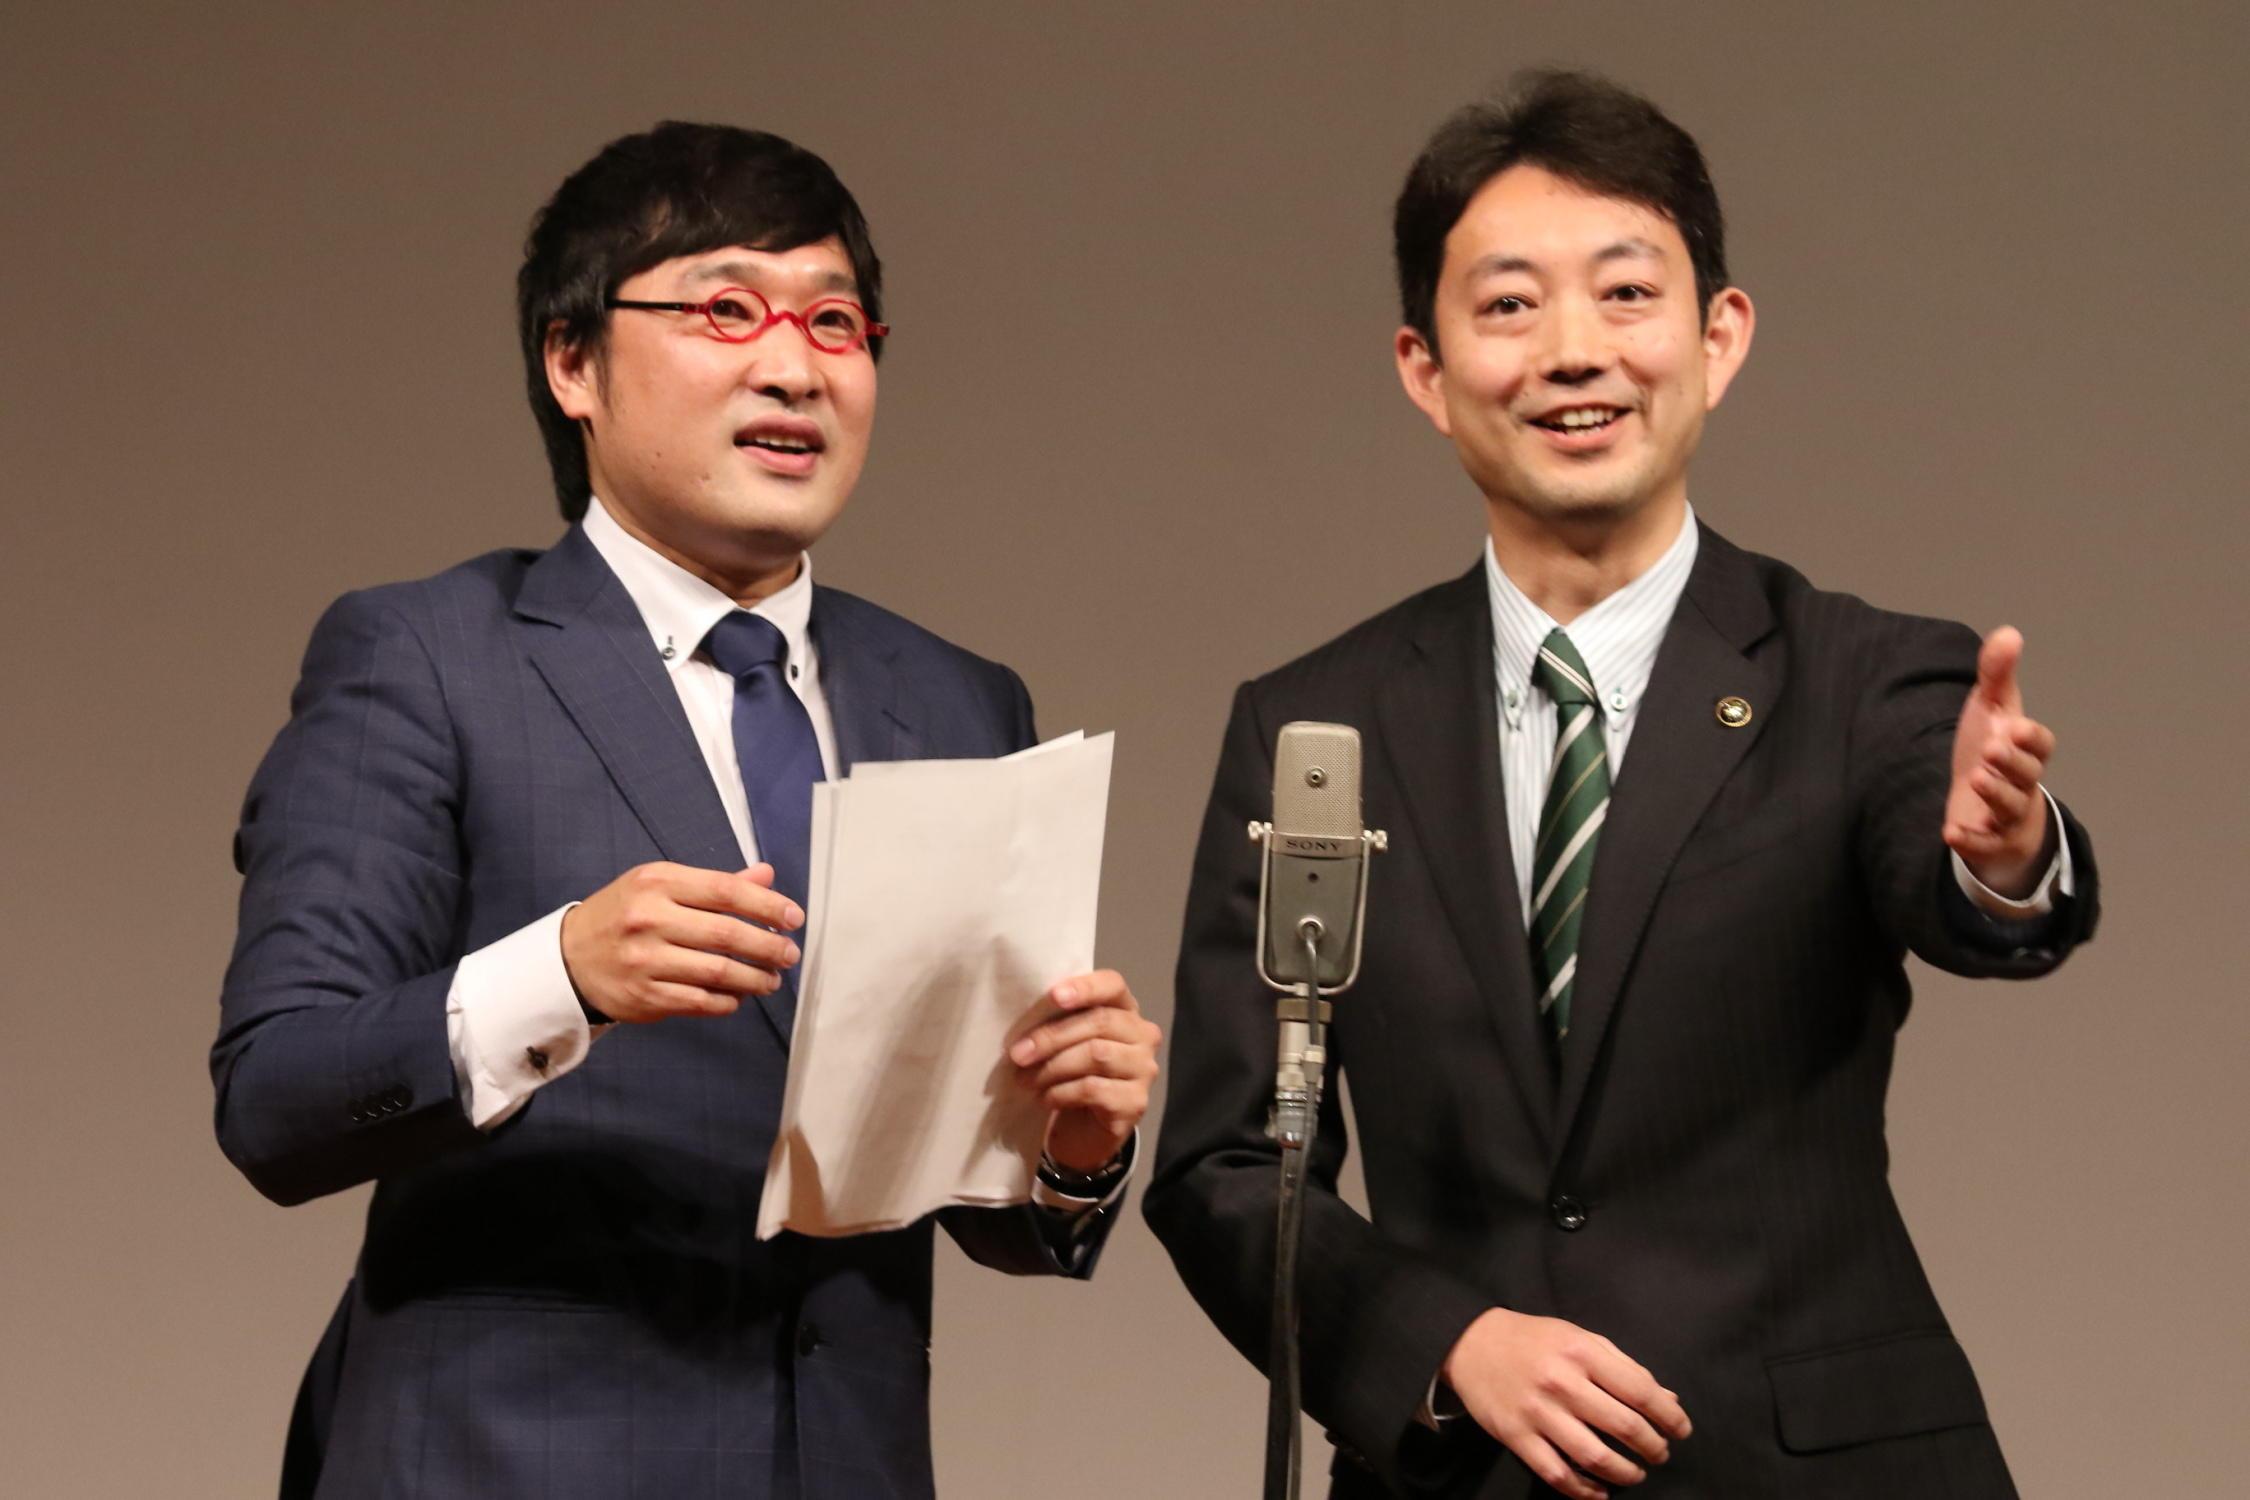 http://news.yoshimoto.co.jp/20180107132807-d64c5a66b0774c682dde2cf6ded7461638a4f41f.jpg